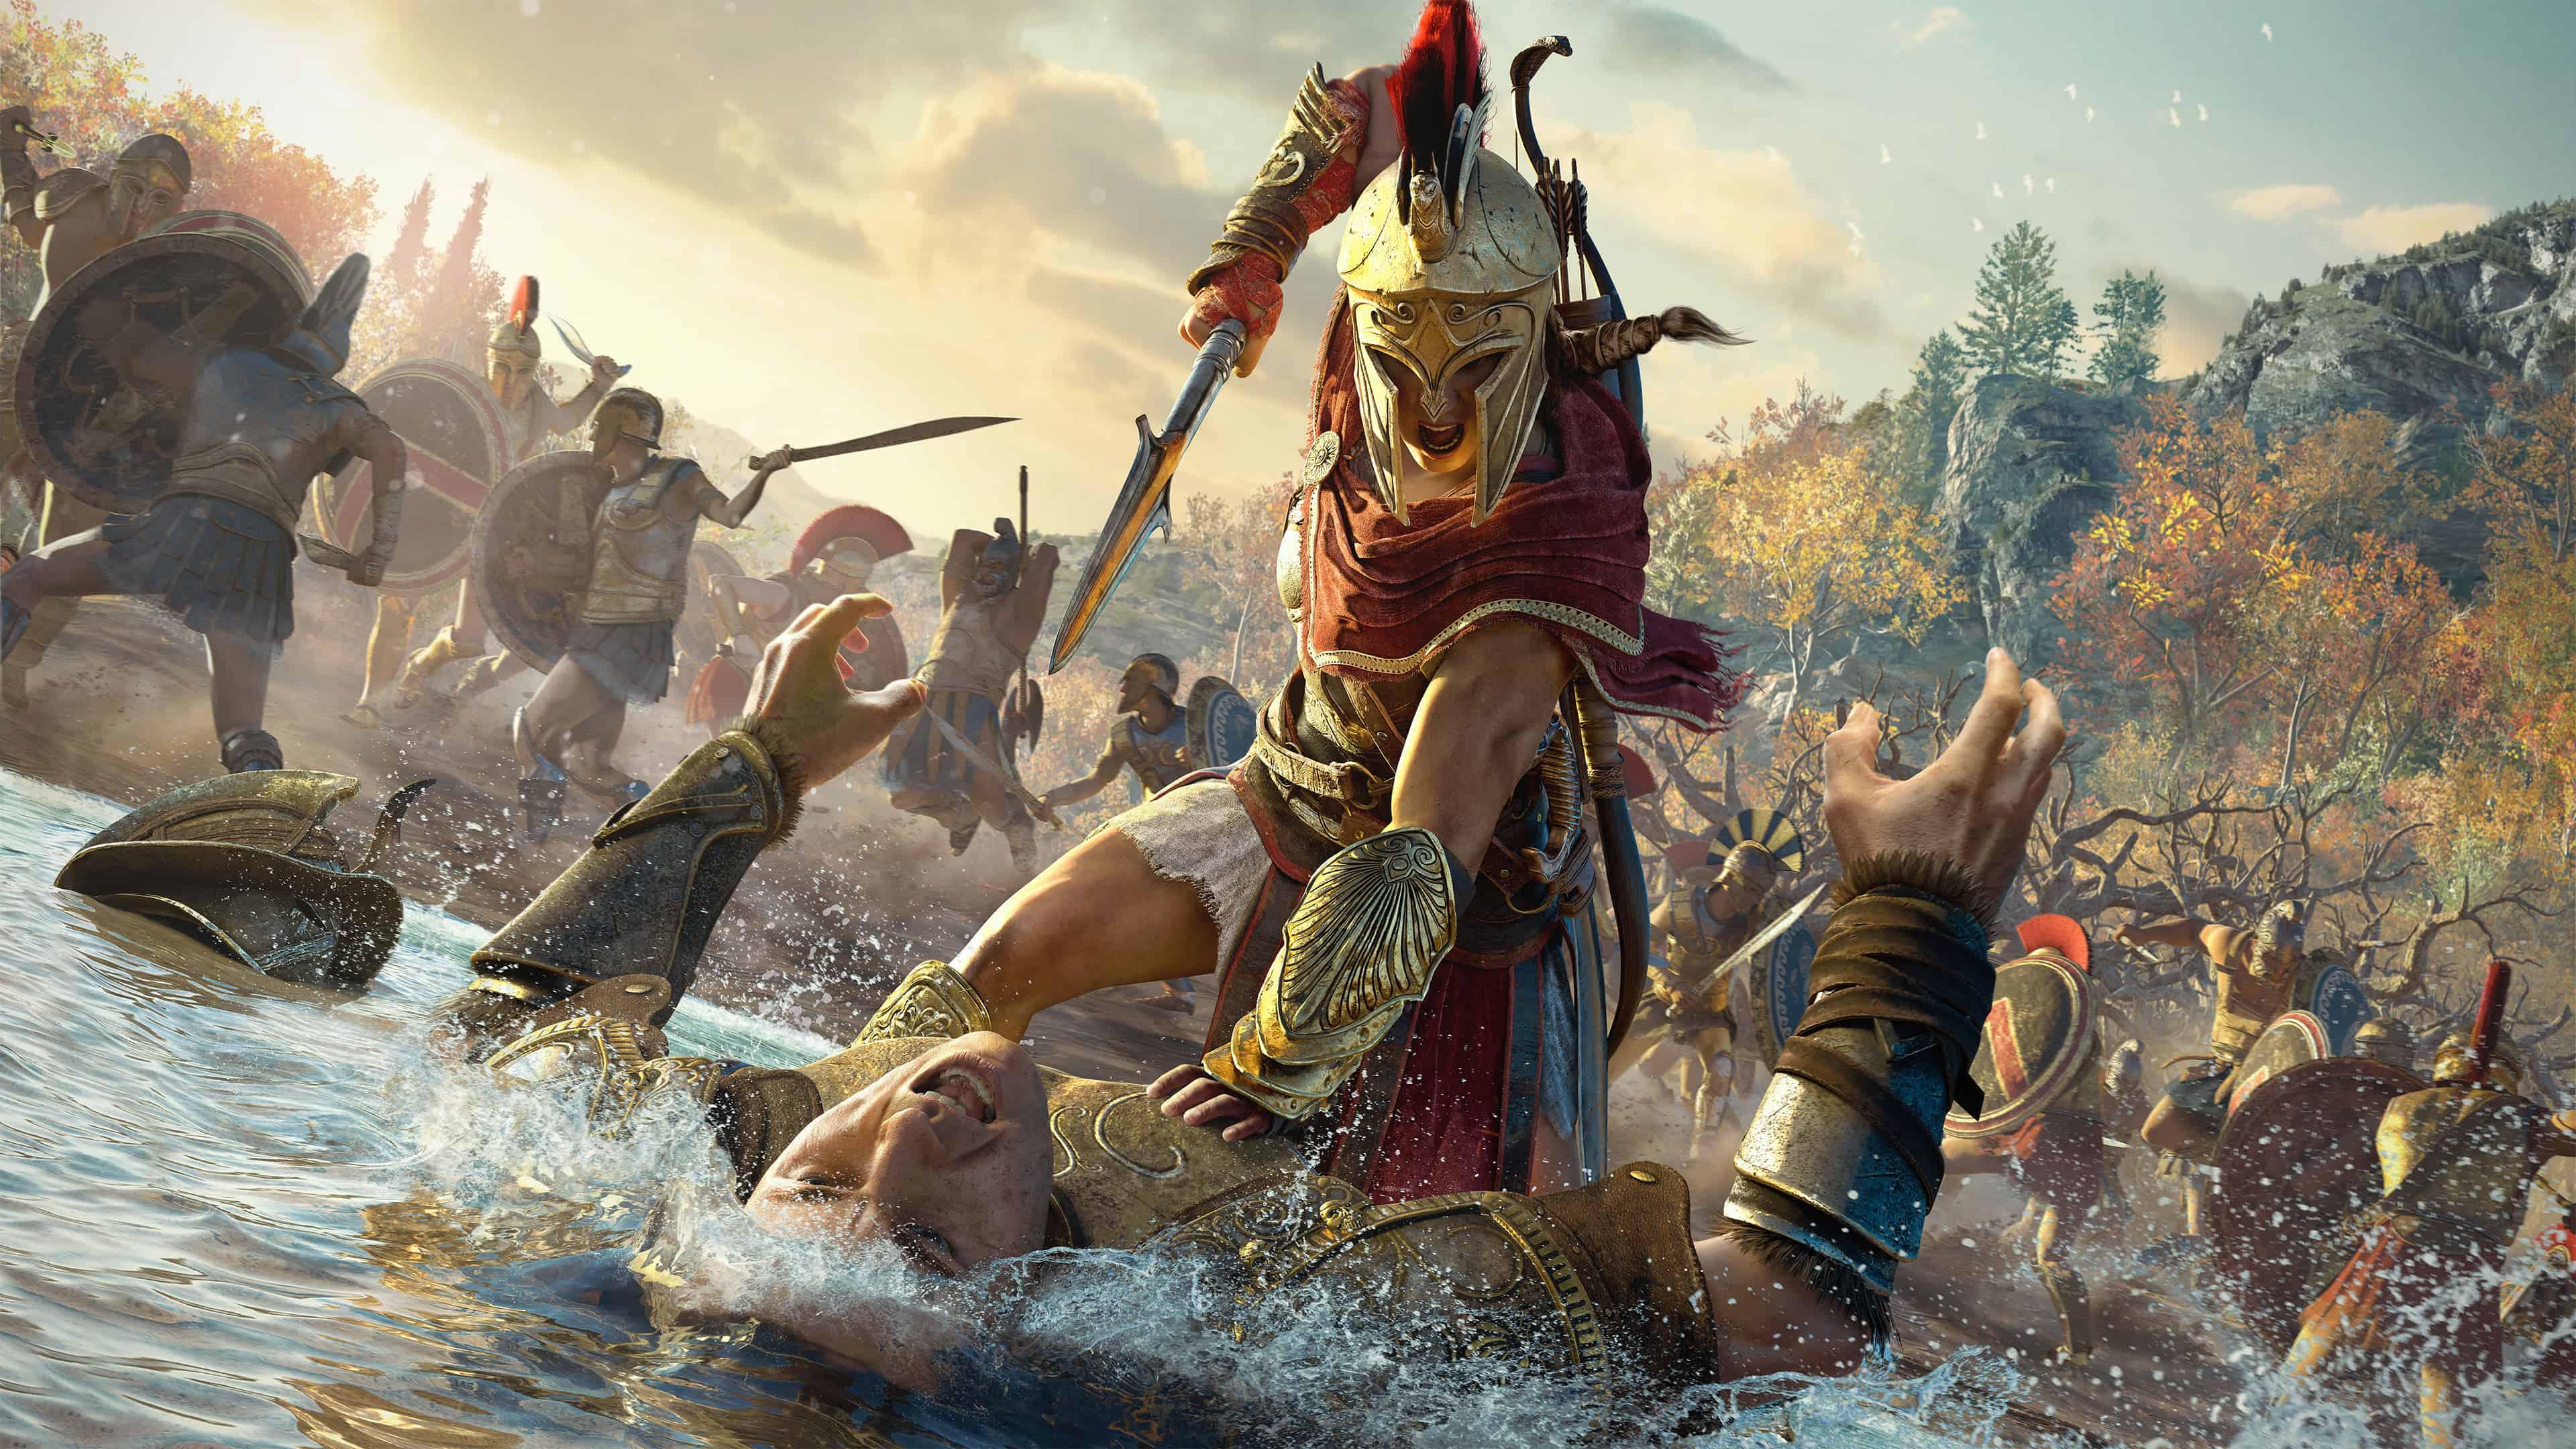 Assassins Creed Odyssey Wallpapers Top Free Assassins